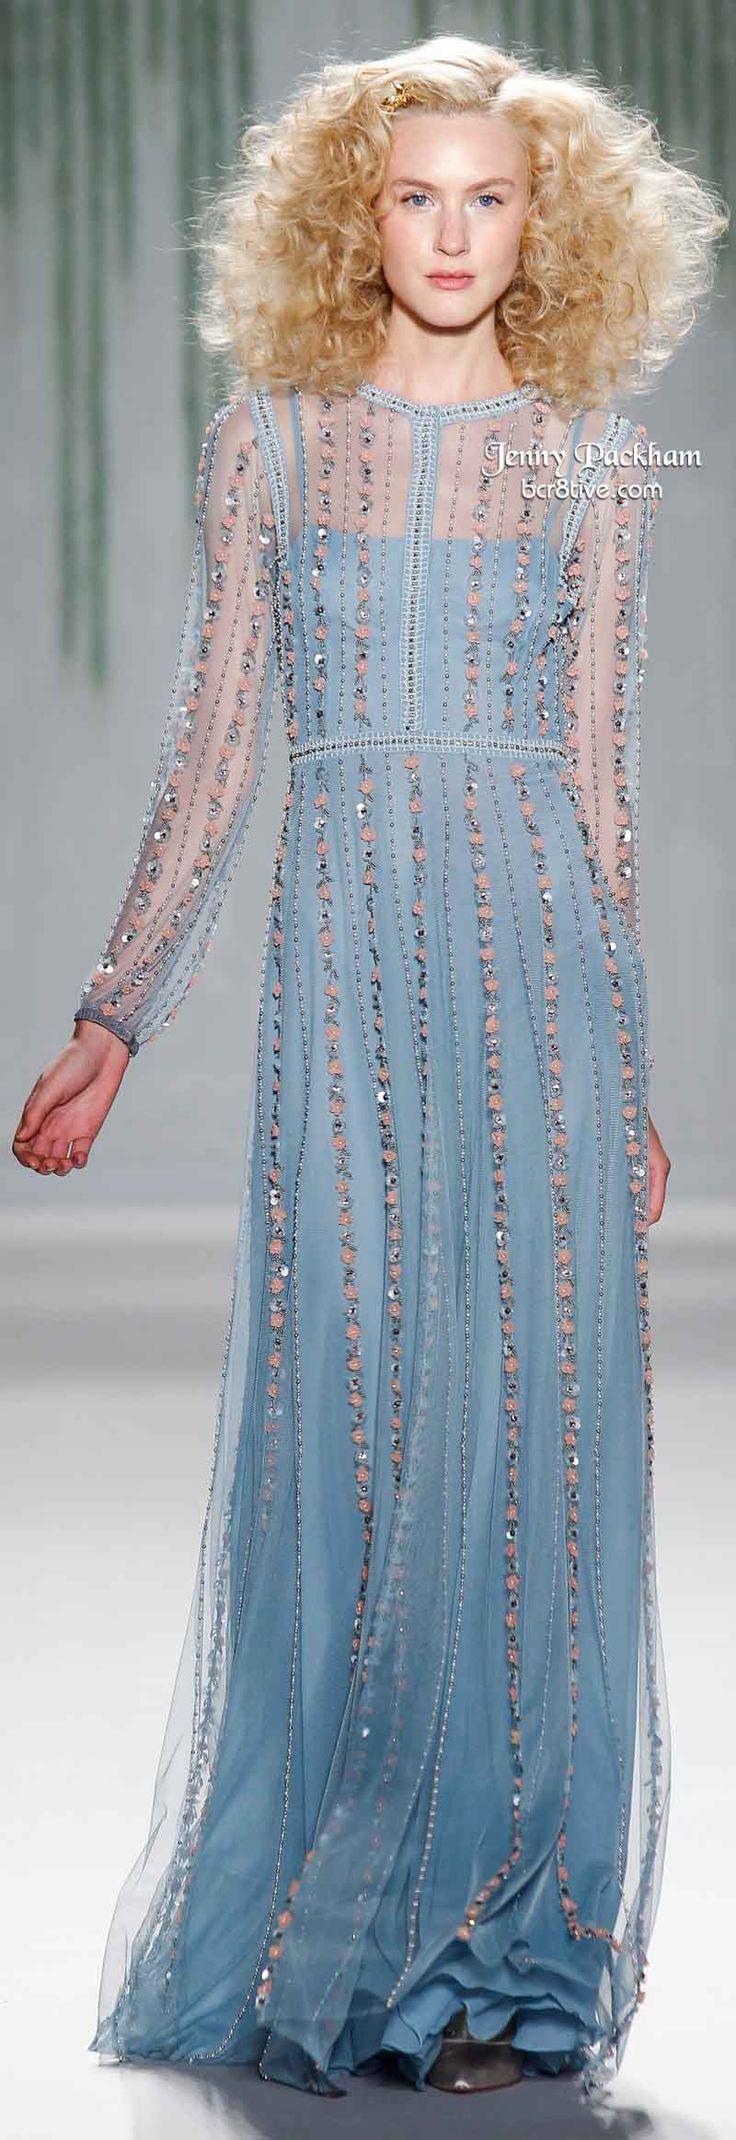 673 best Jenny Packham images on Pinterest | High fashion, Jenny ...